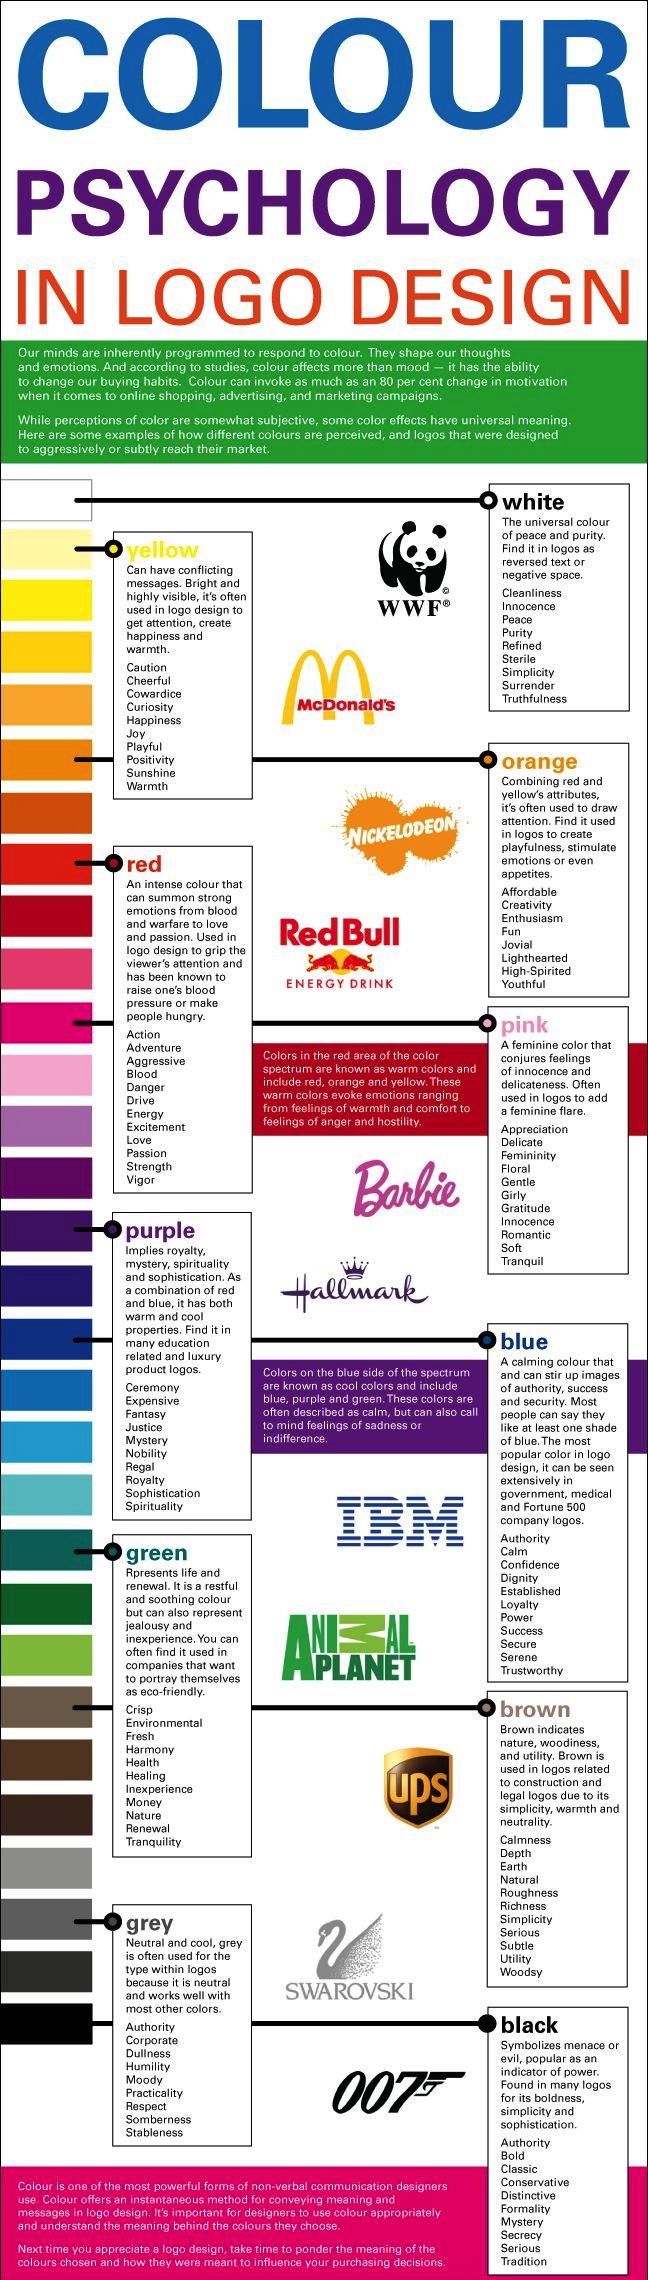 Color Physiology in Logo Design!!!! Logo design